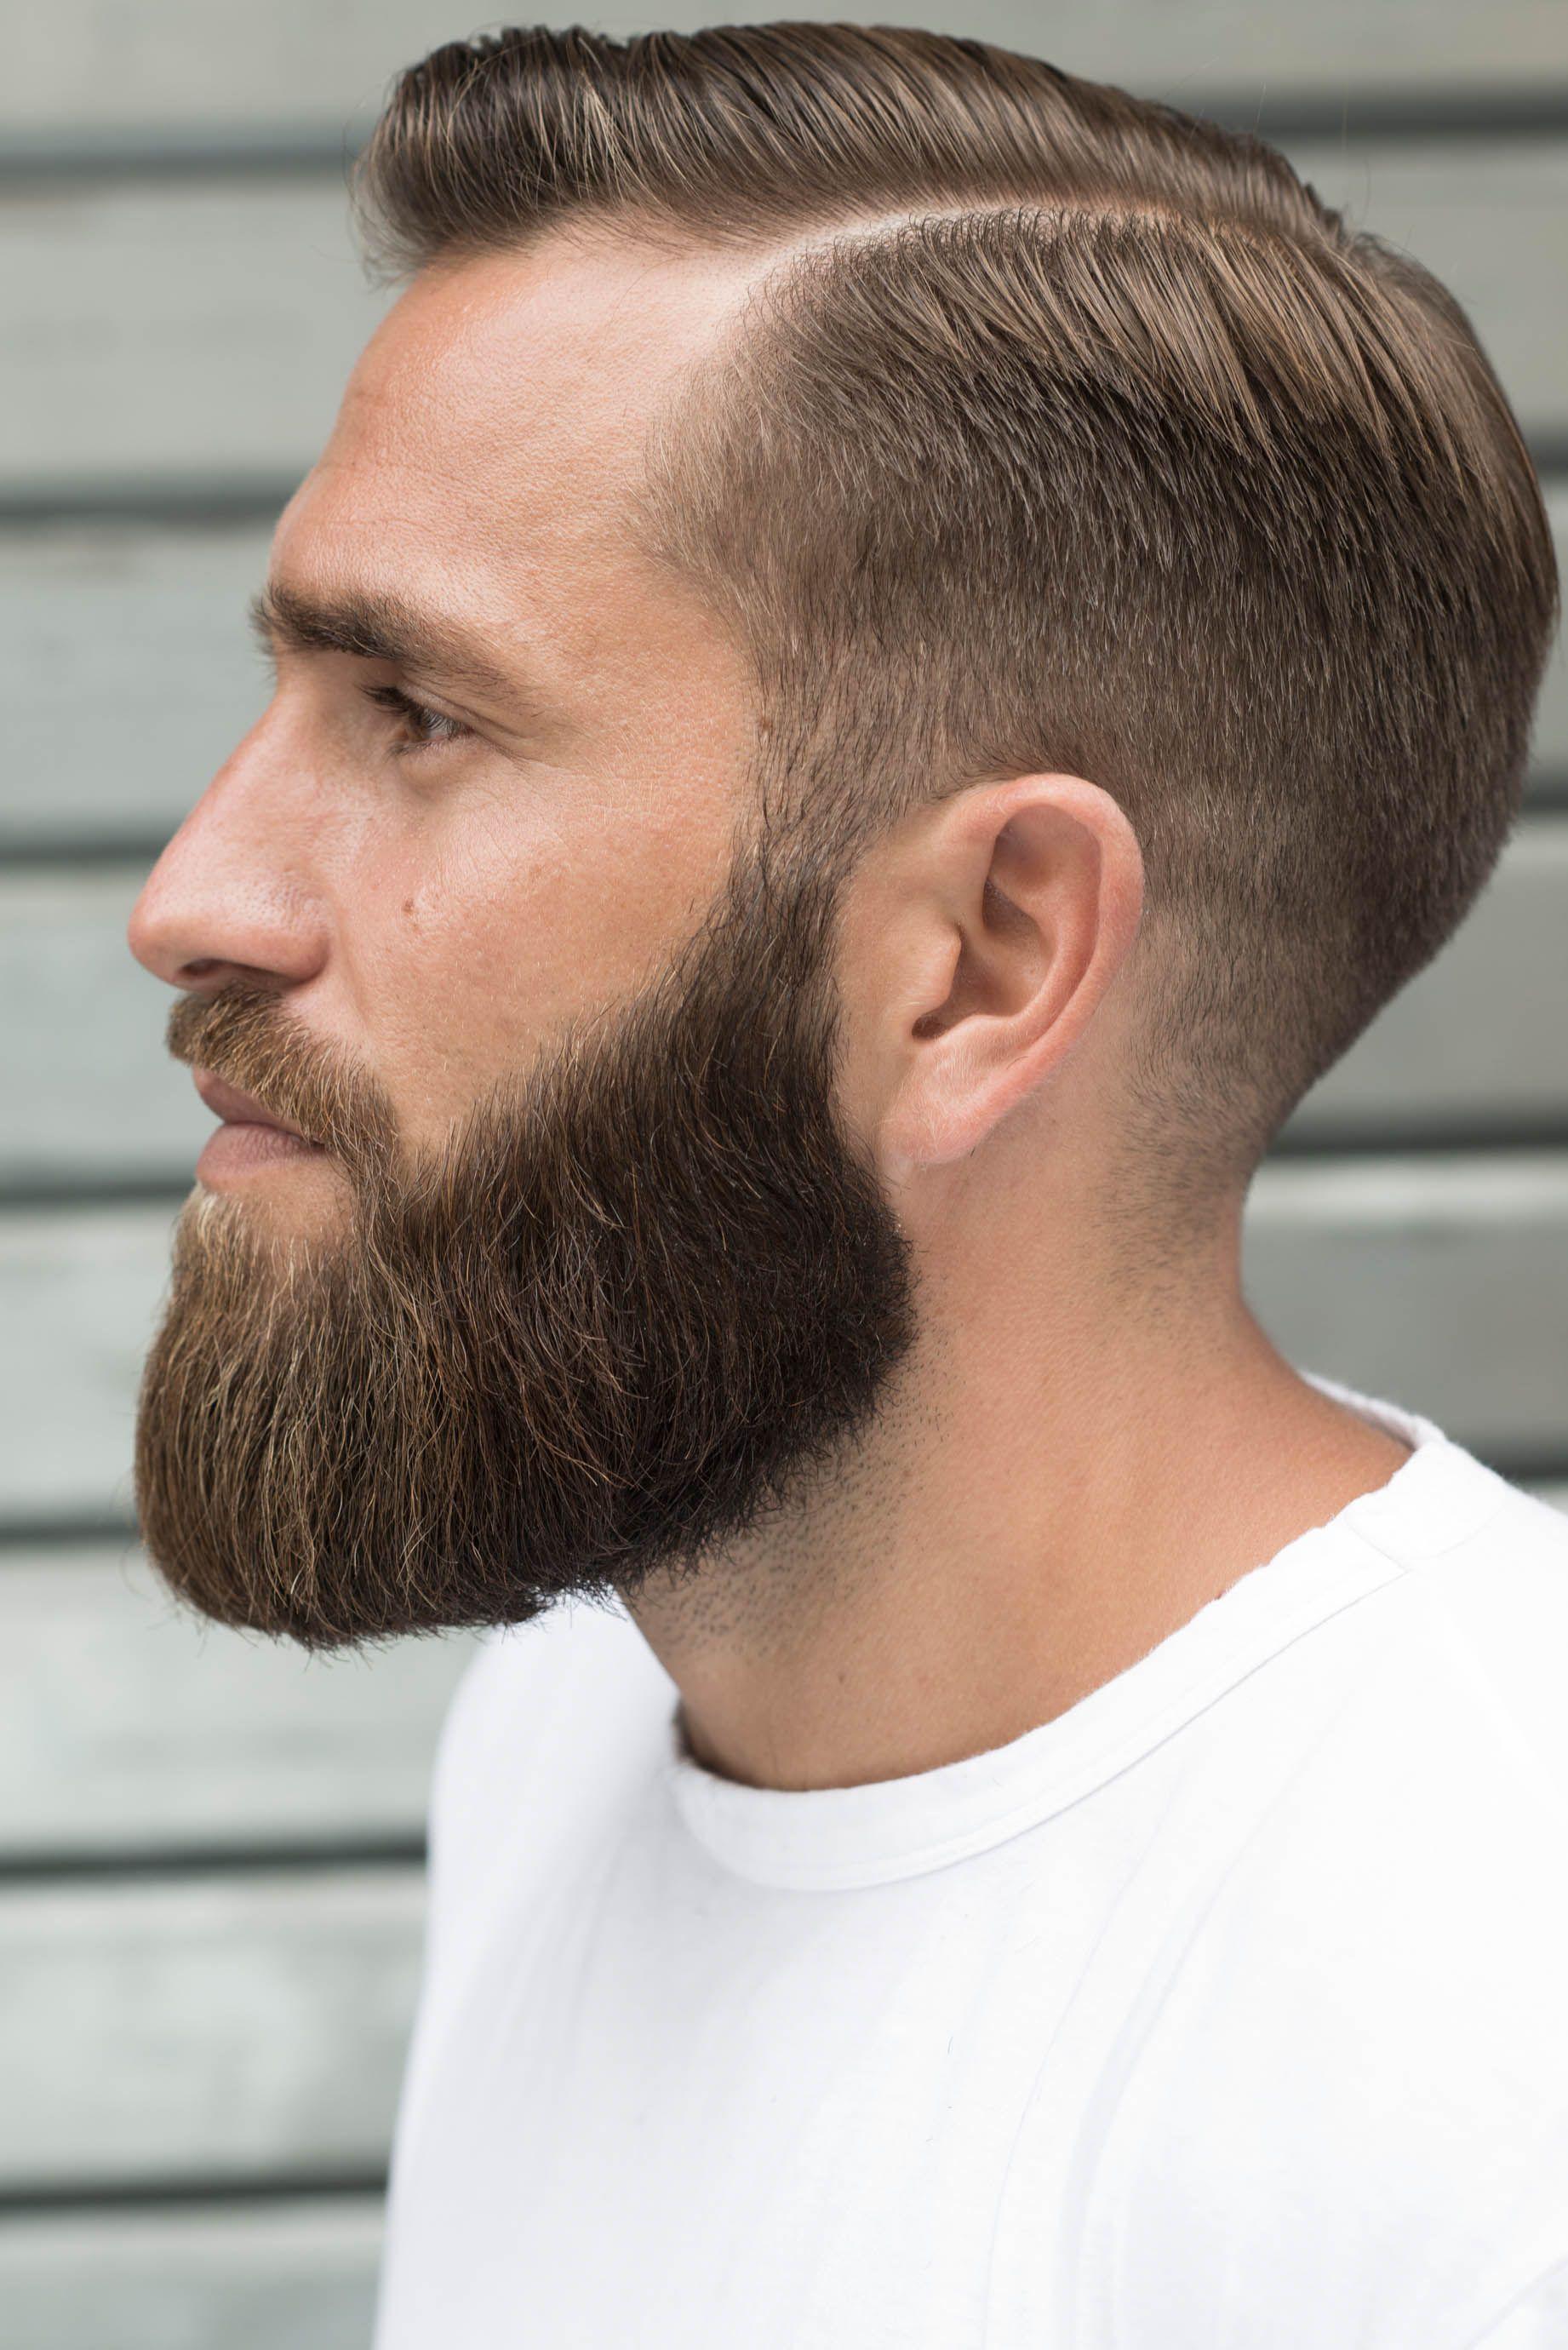 Loving That Beard.